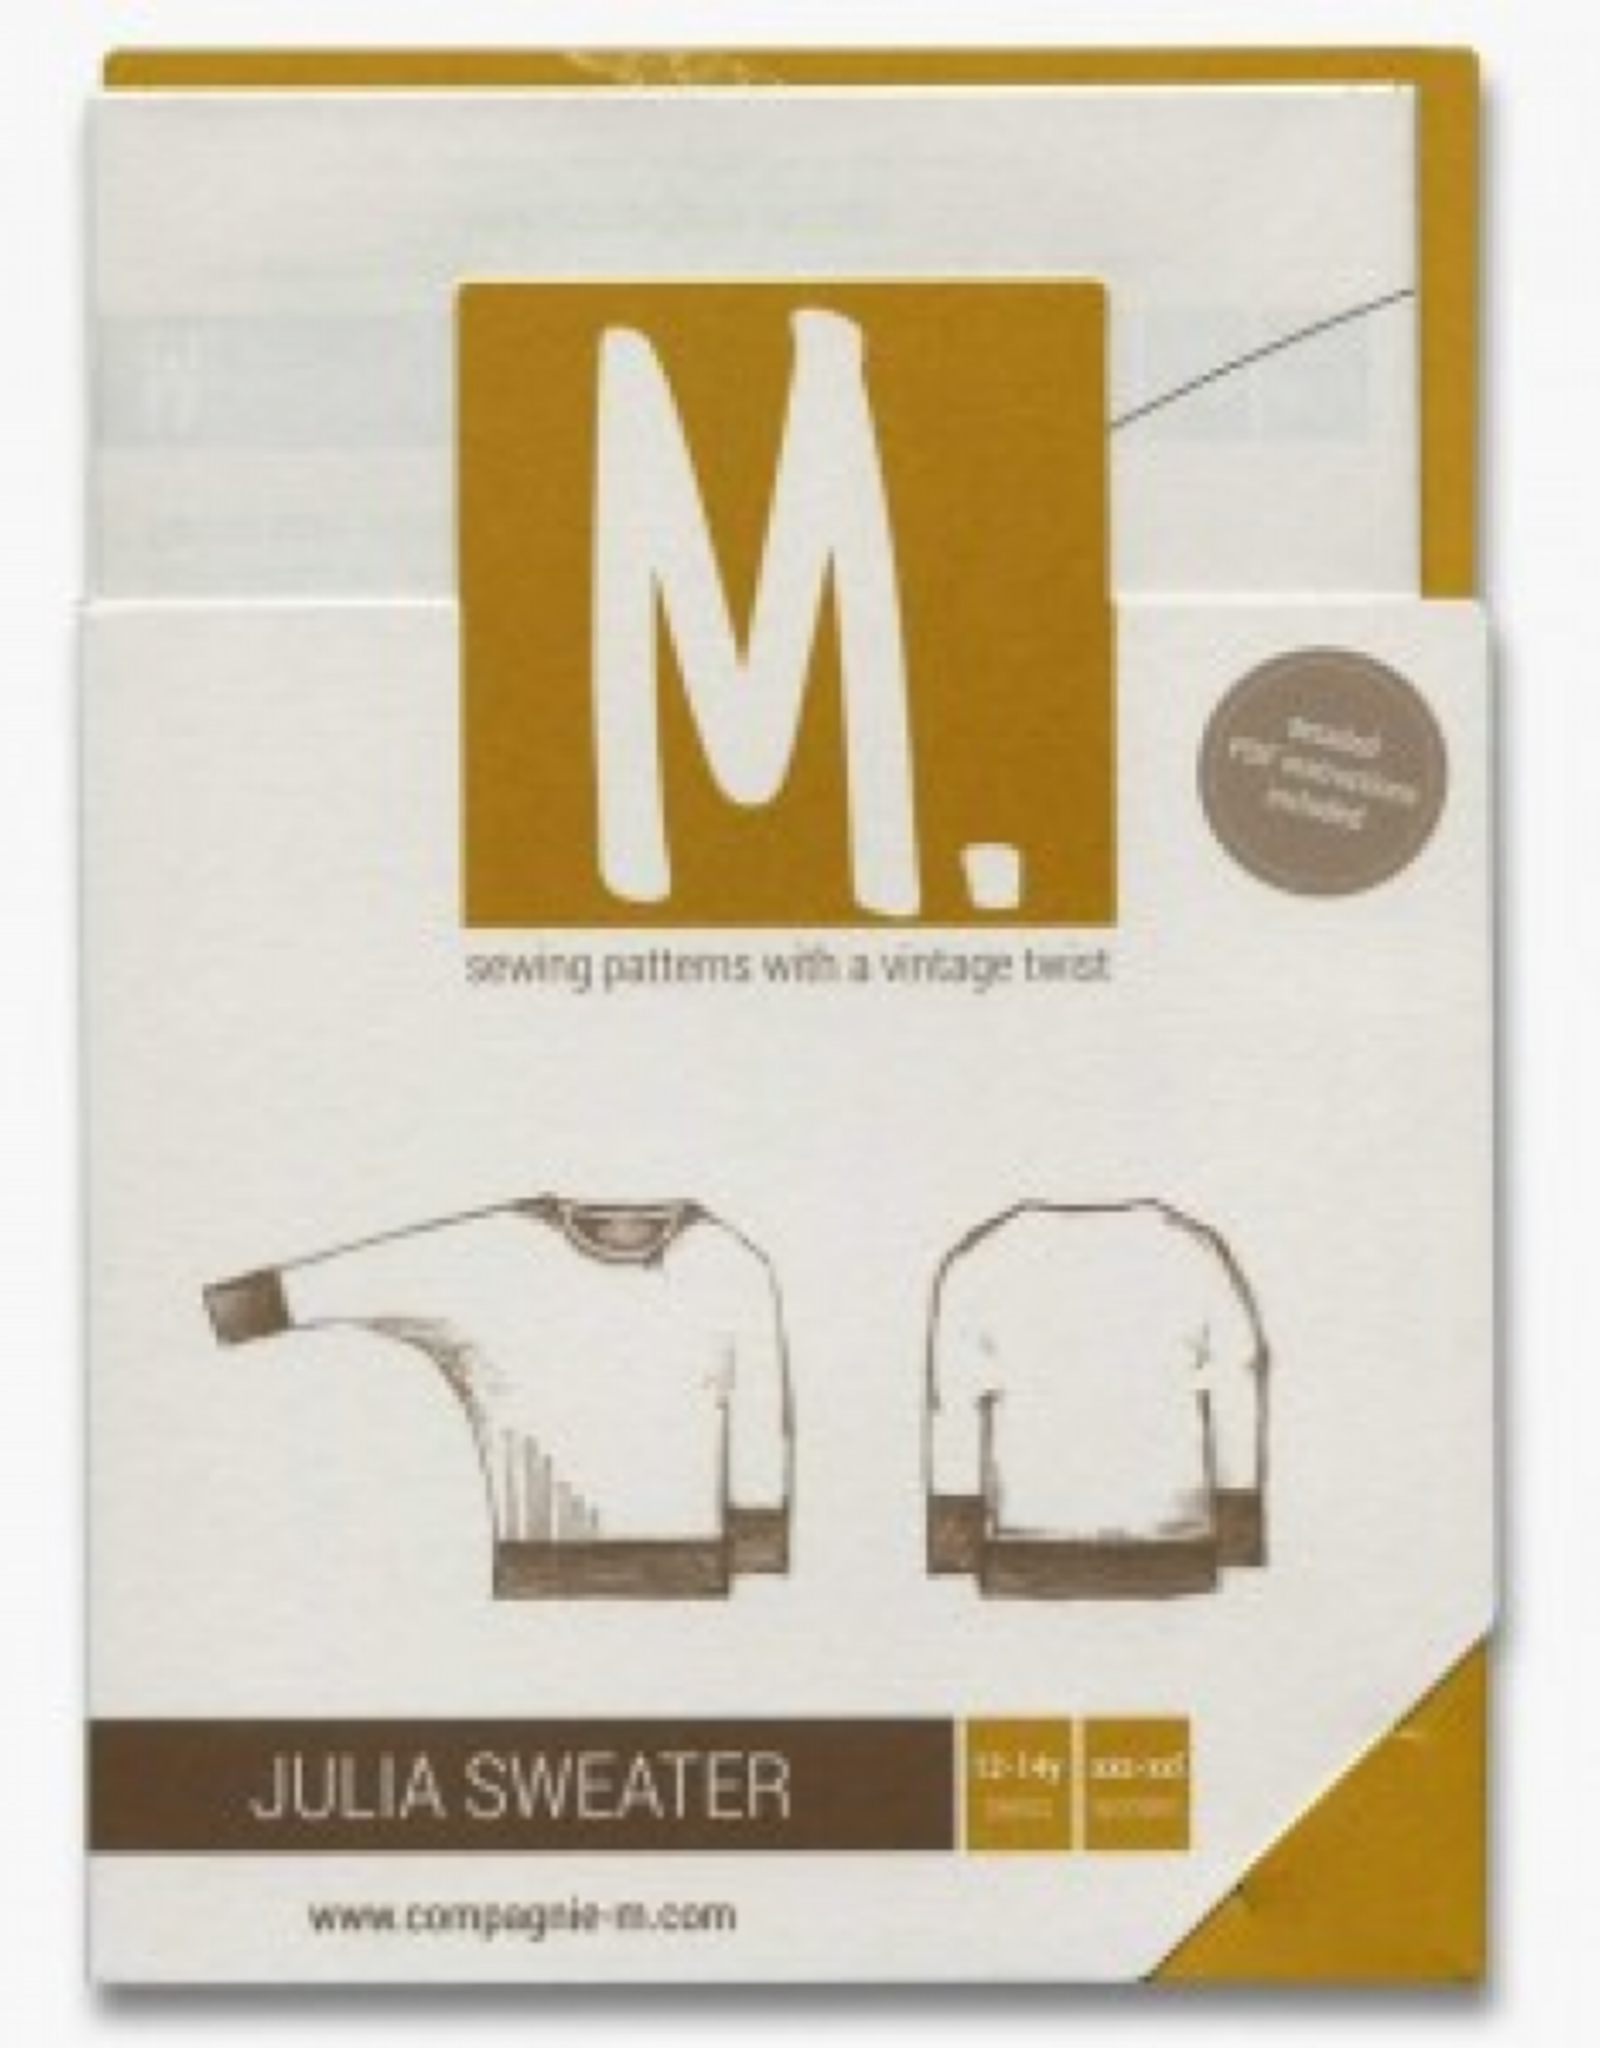 Compagnie M Compagnie M Julia sweater kinderen